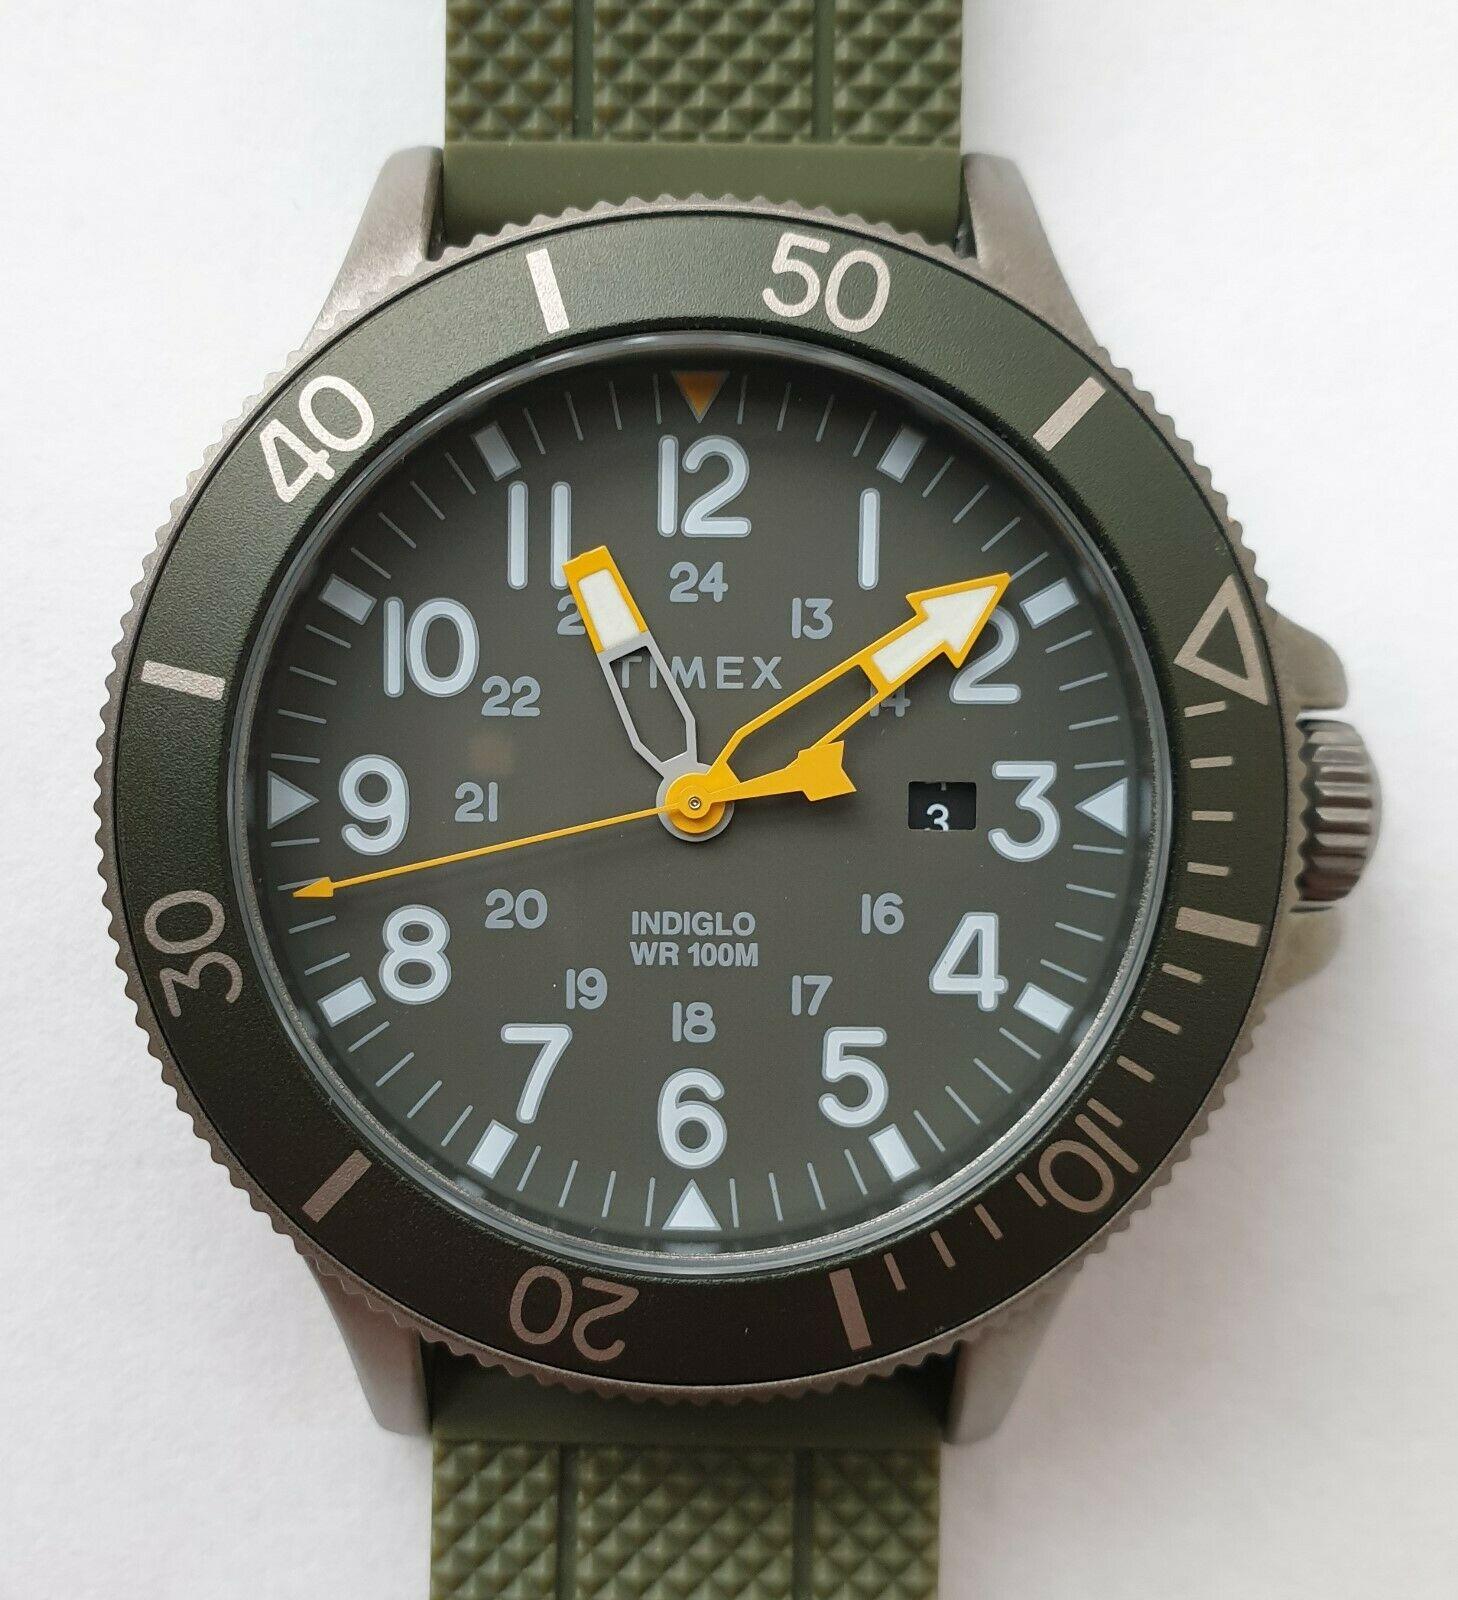 Timex G 4